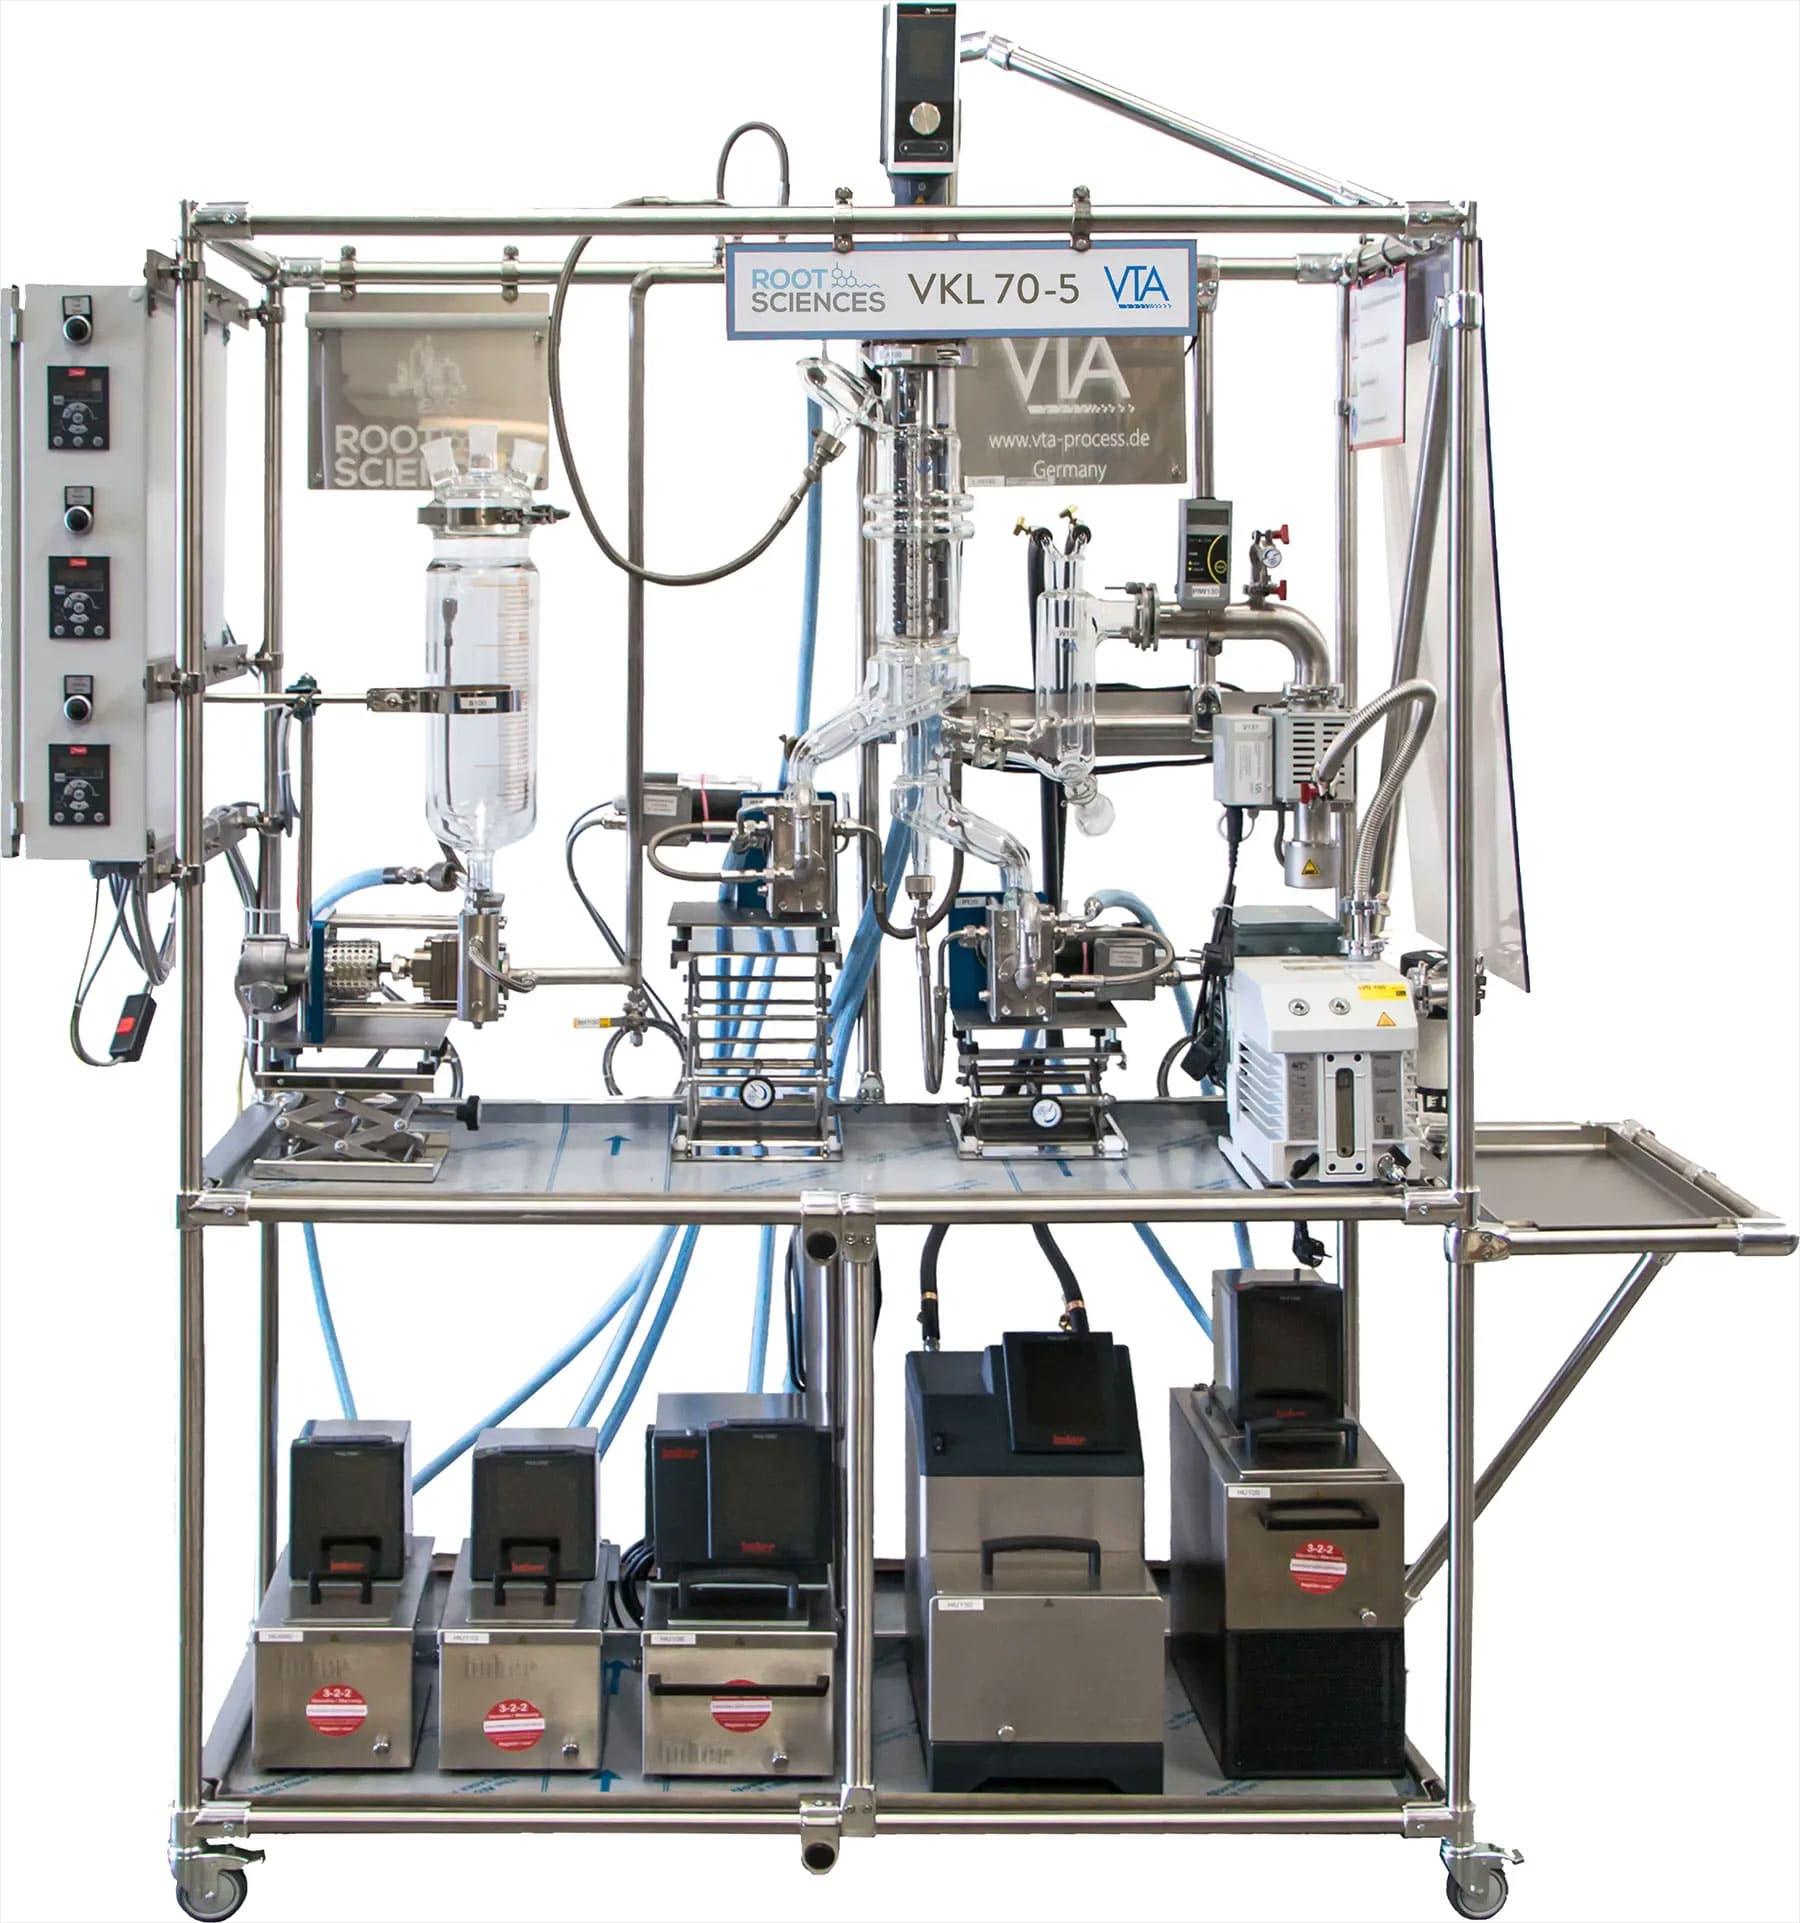 vkl-70-5 cannabis distillation equipment